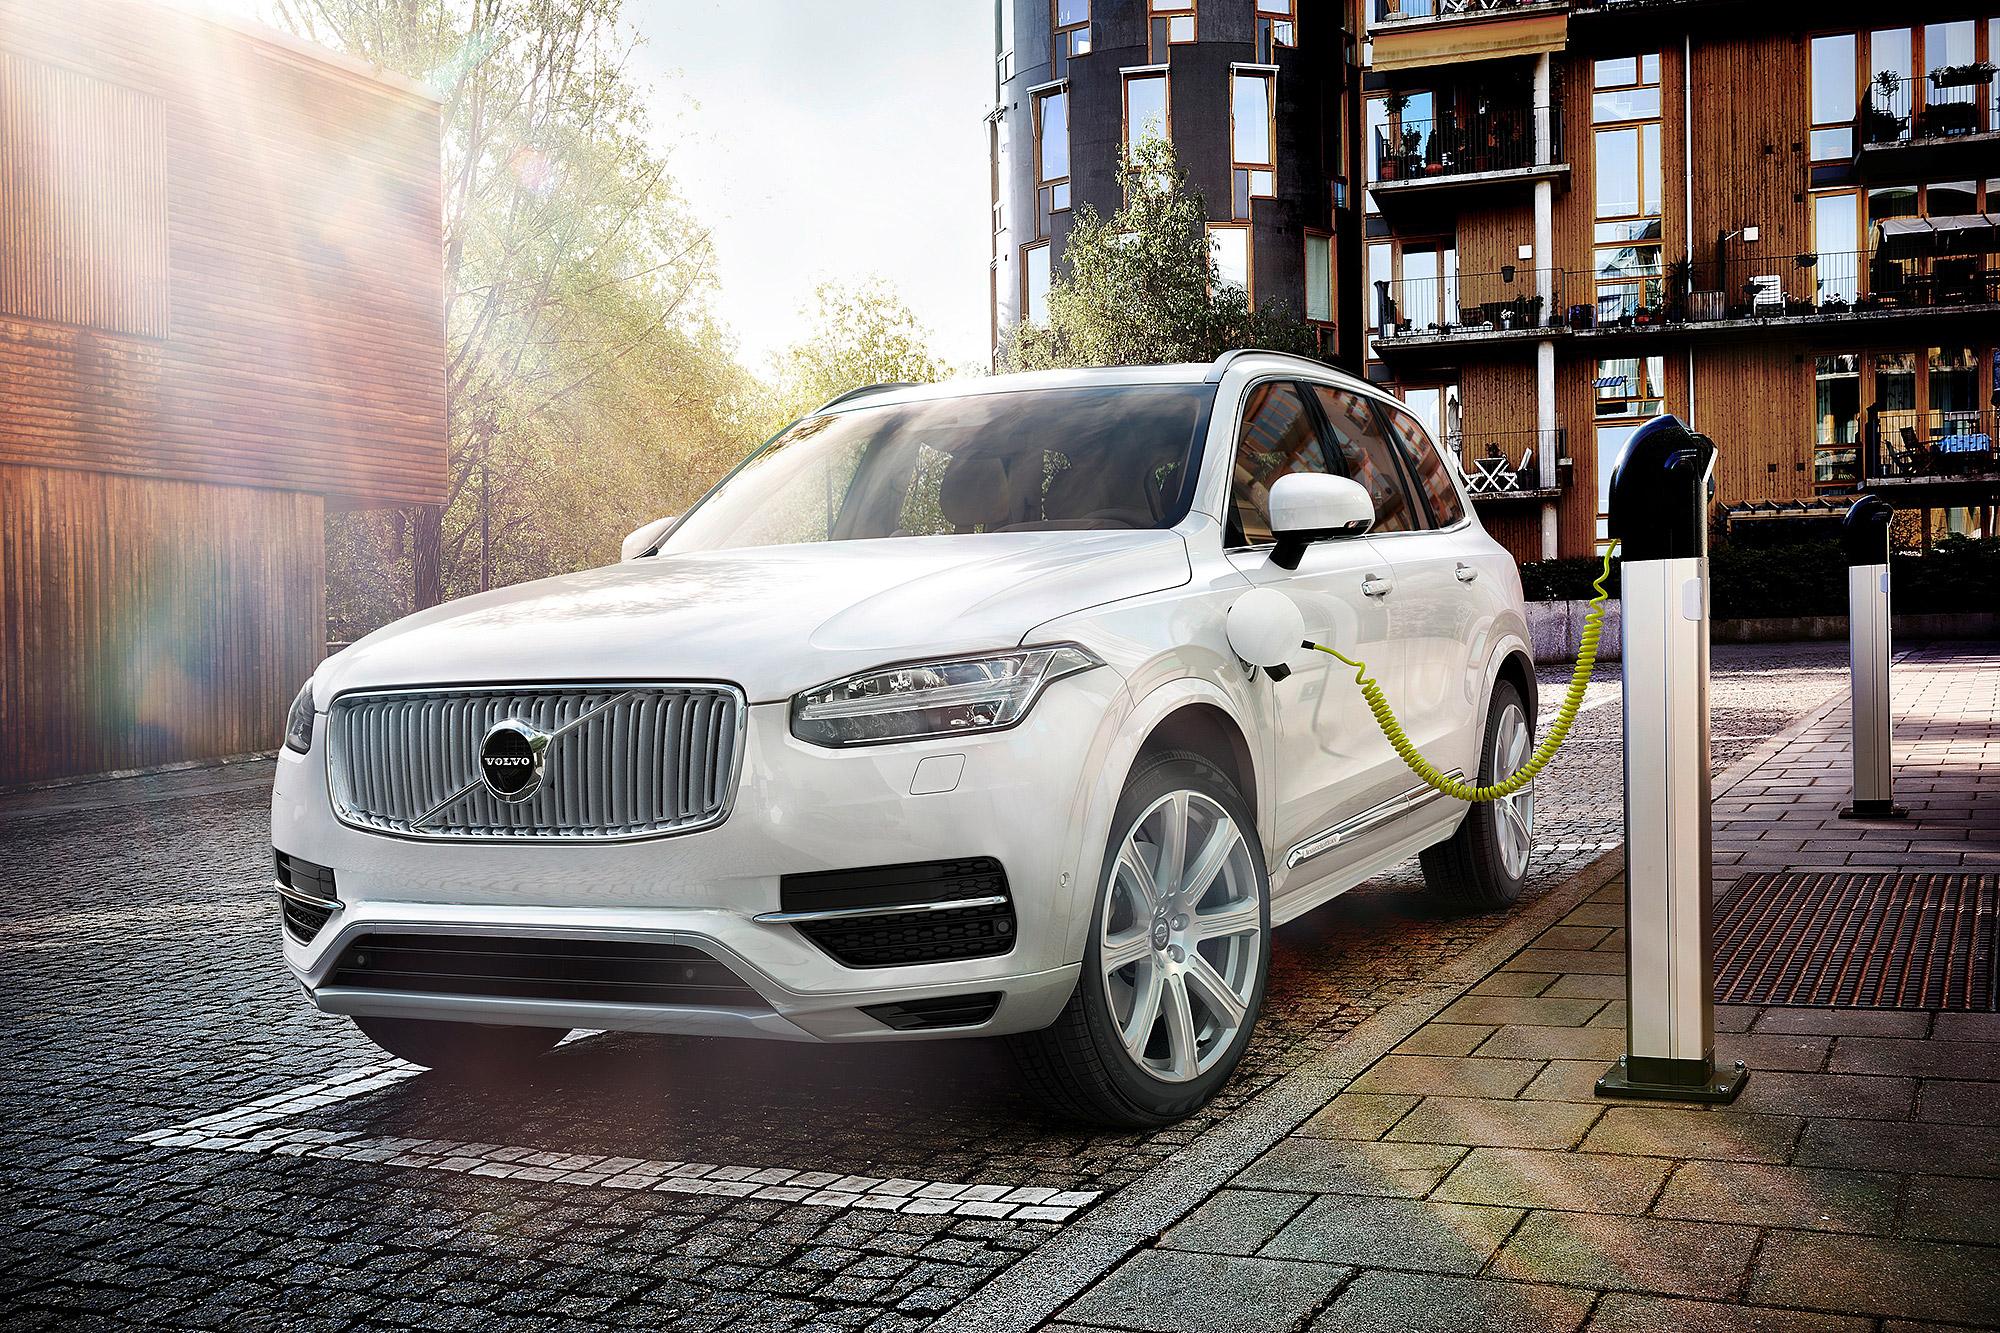 XC90 T8 Twin Engine 是 SPA 模組化平台的首款 PHEV 動力產品,也宣示 Volvo 的電動化戰略全面啟動。